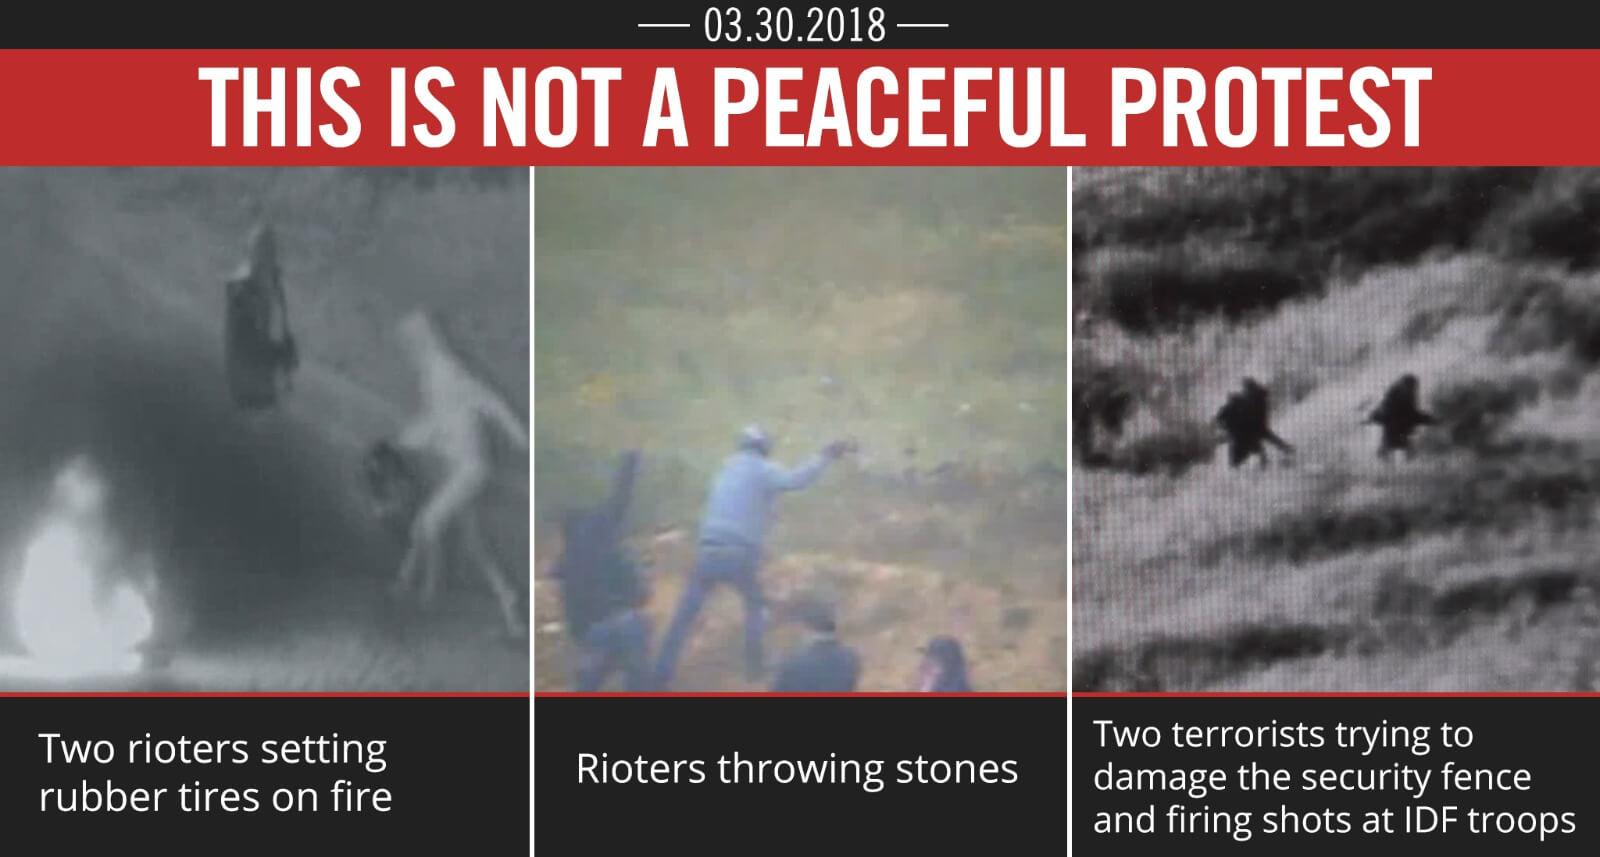 HAMAS MOUNTS VIOLENT RIOT ON ISRAEL'S BORDER